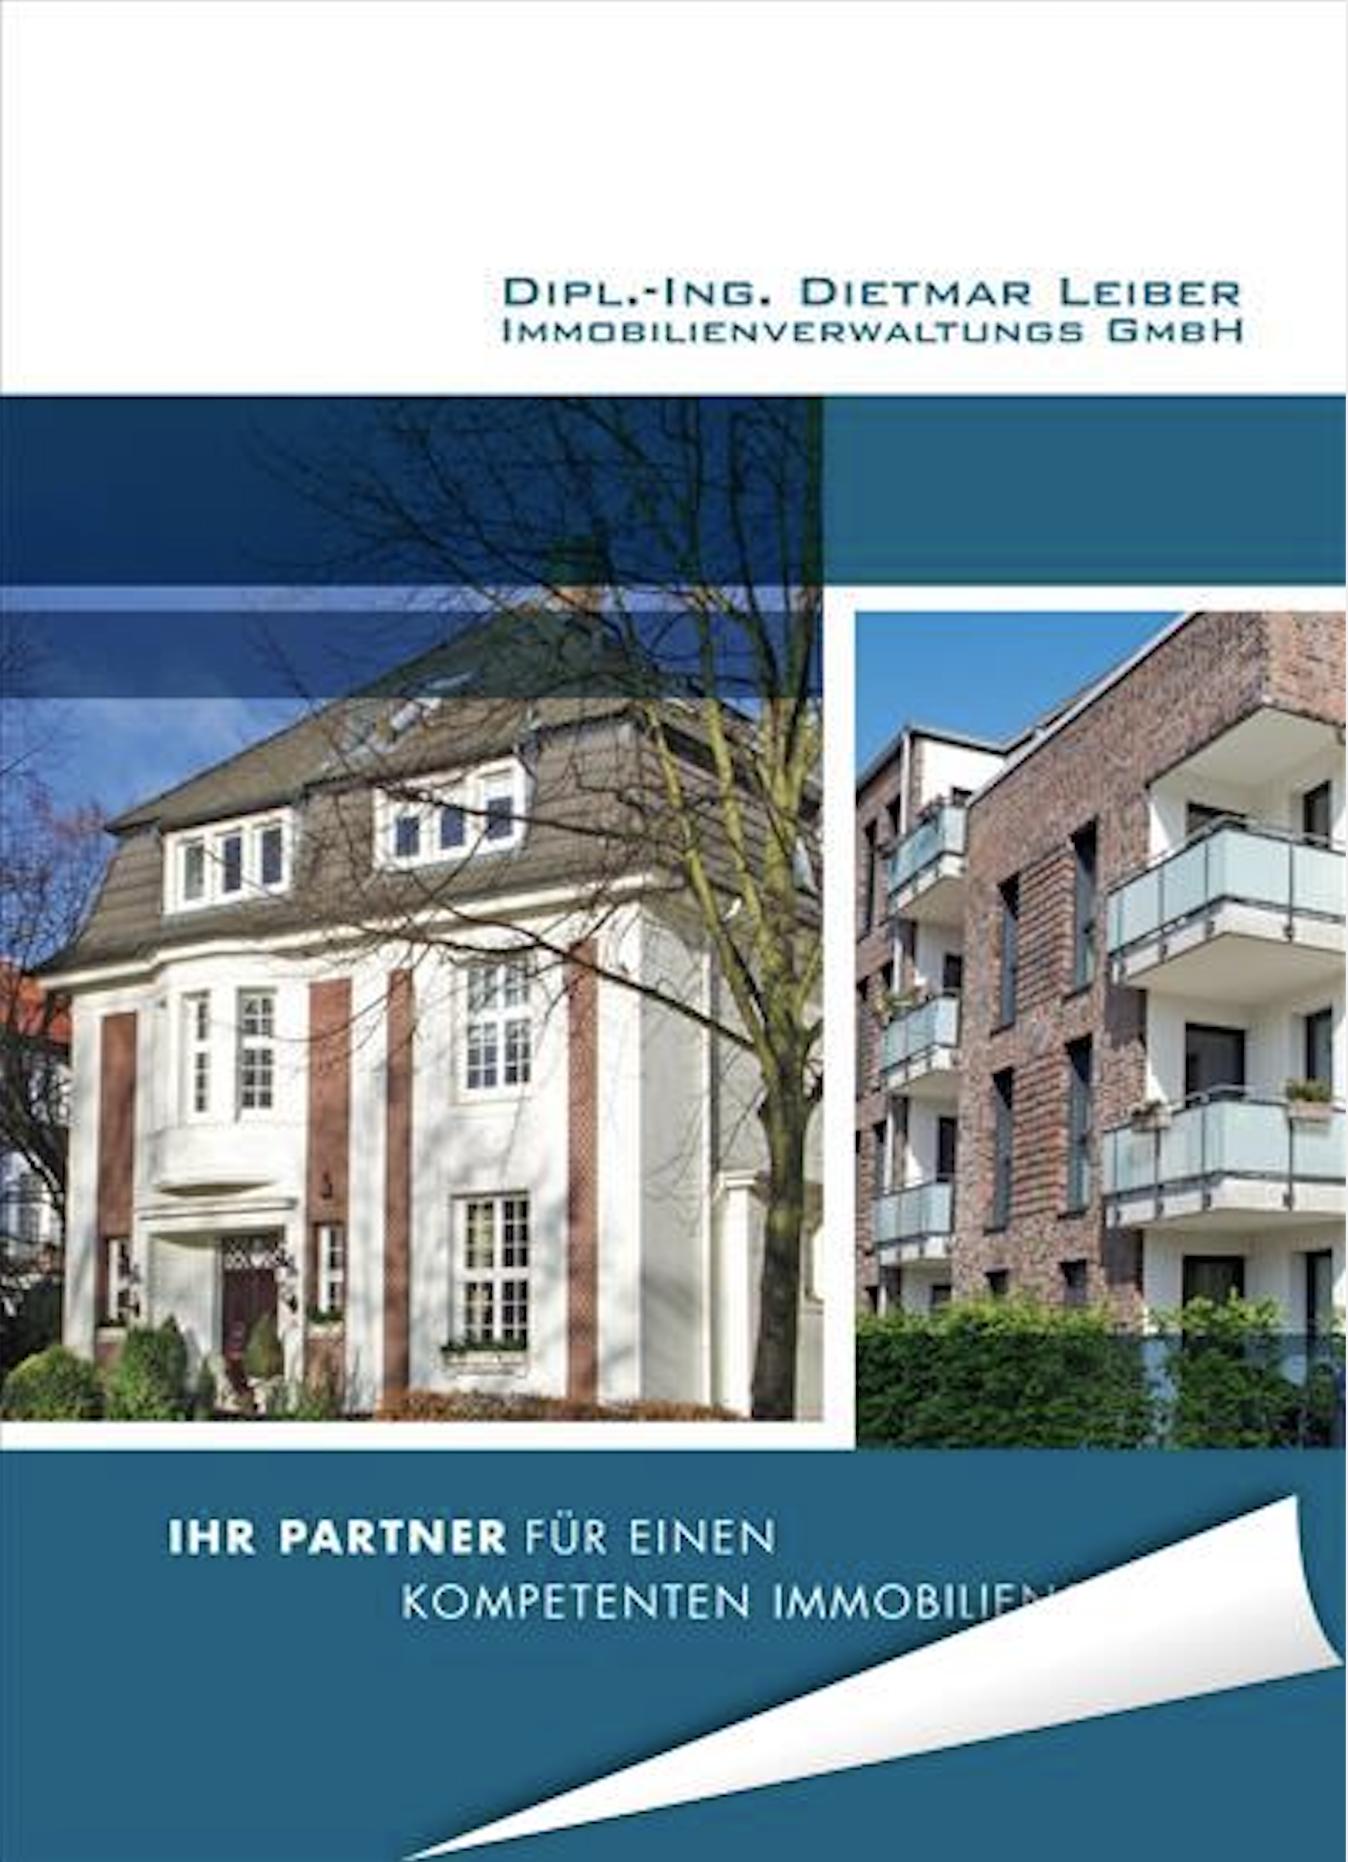 https://www.verwaltung-leiber.de/wp-content/uploads/Ohne-Titel.png